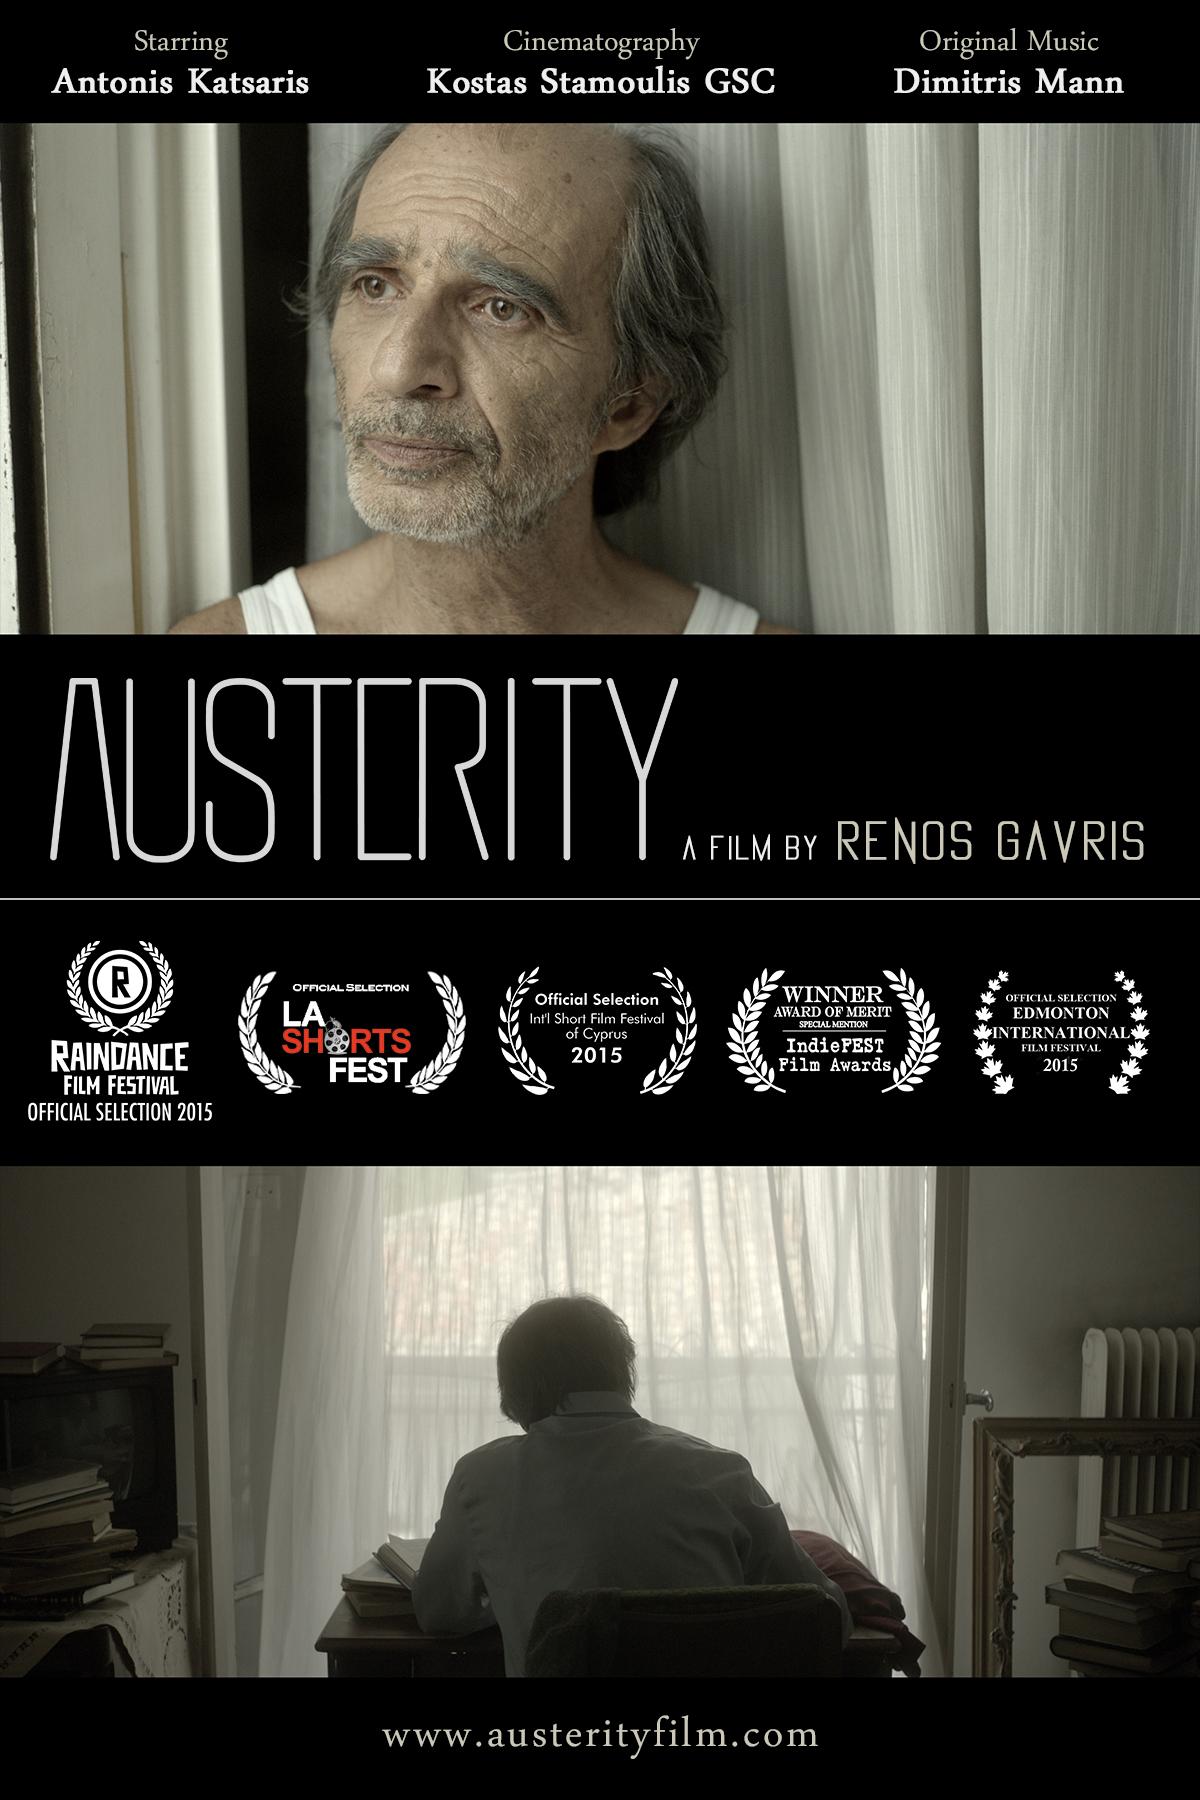 Austerity screening flyer.jpg